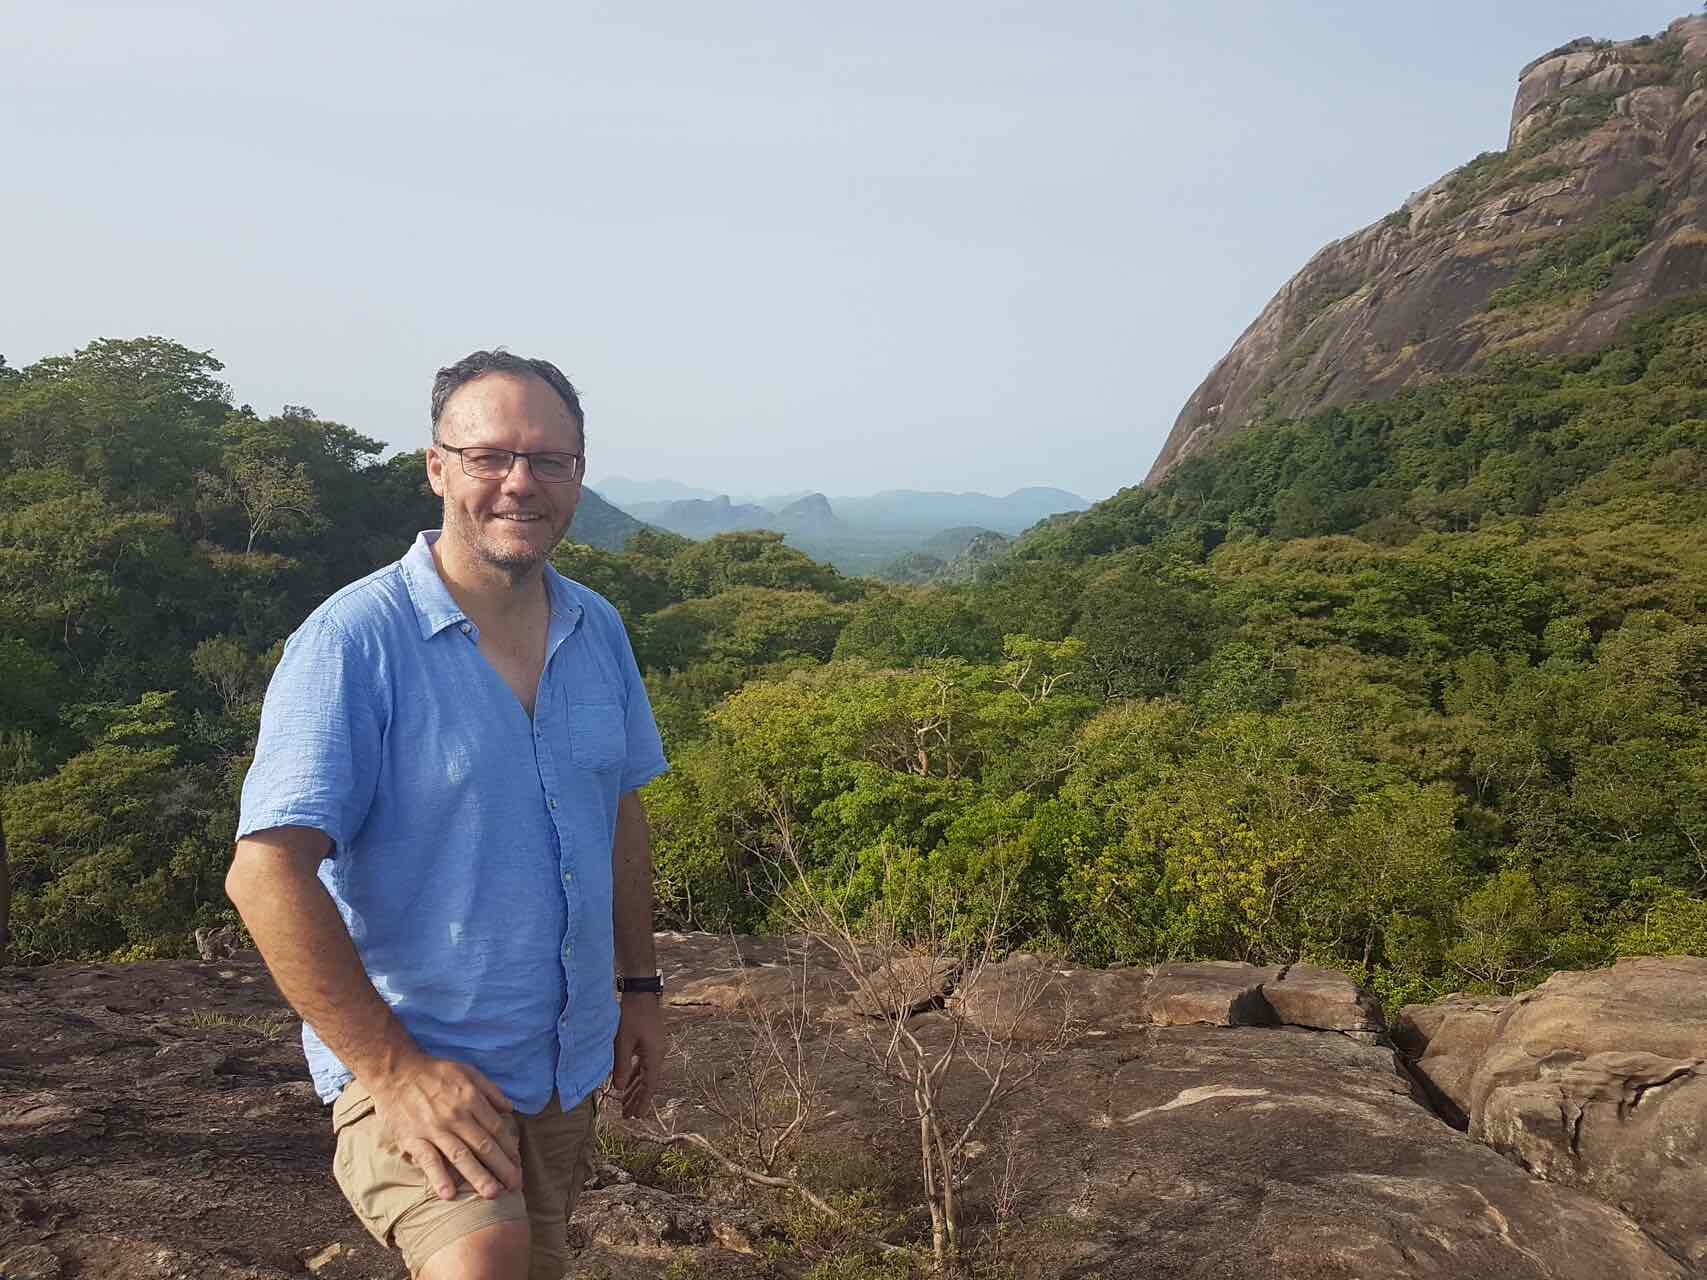 sri-lanka-gal-oya-hike-holiday-review-feedback-invite-to-paradise-quentin-kate-hulm.jpg